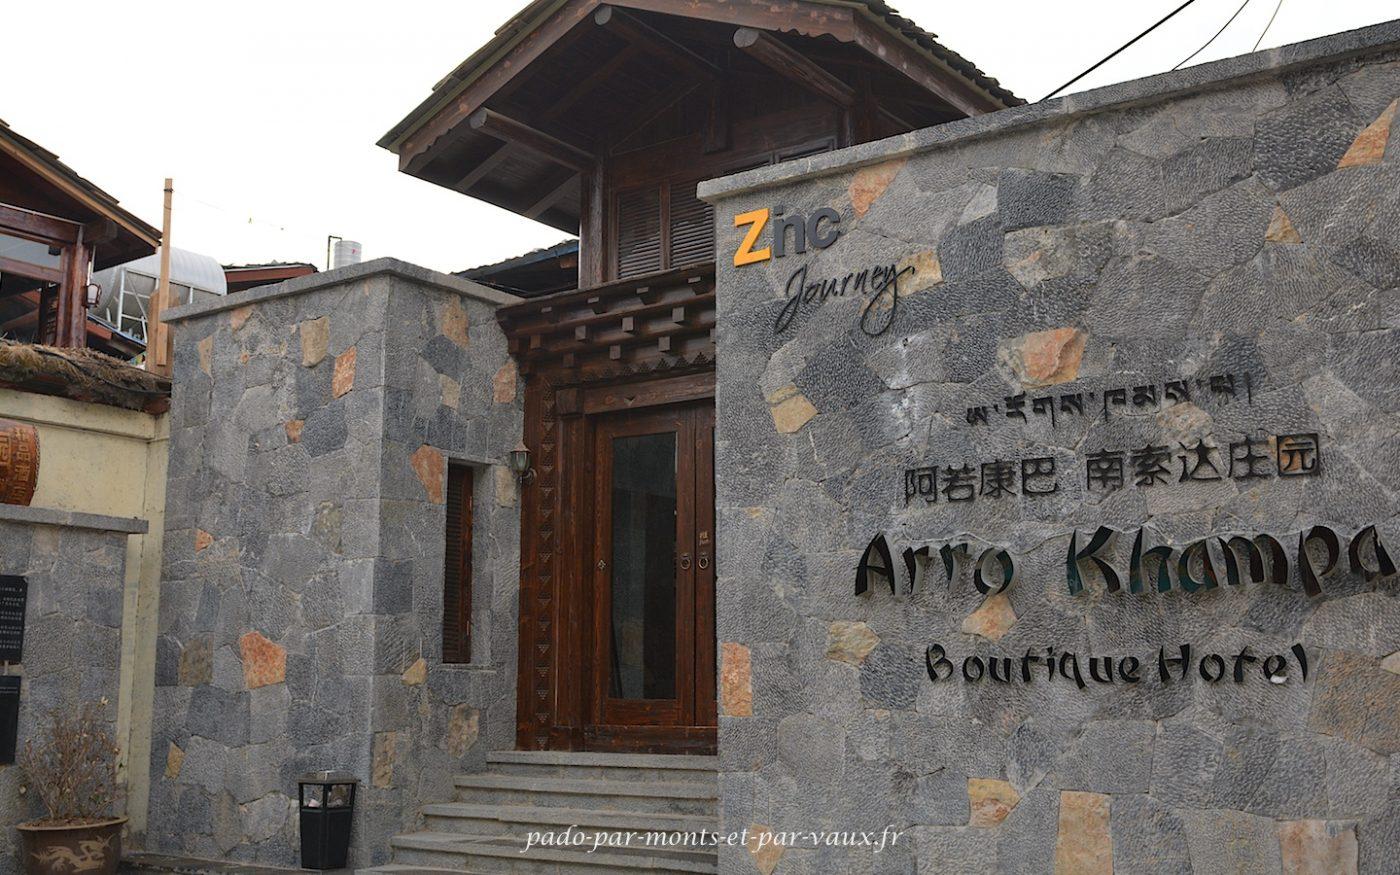 Arro Khampa hotel